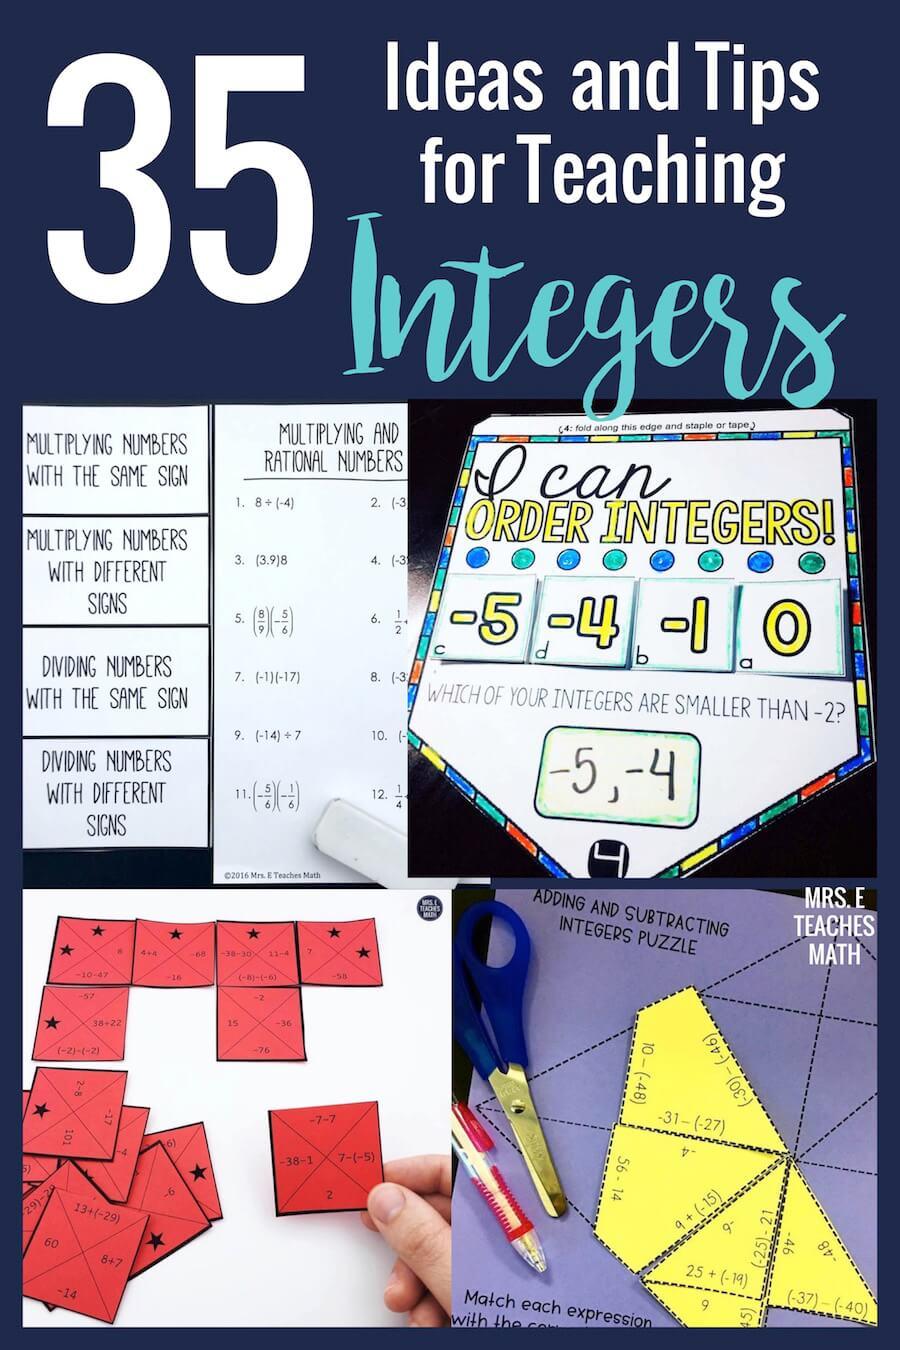 20+ Ideas and Tips for Teaching Integers   Mrs. E Teaches Math